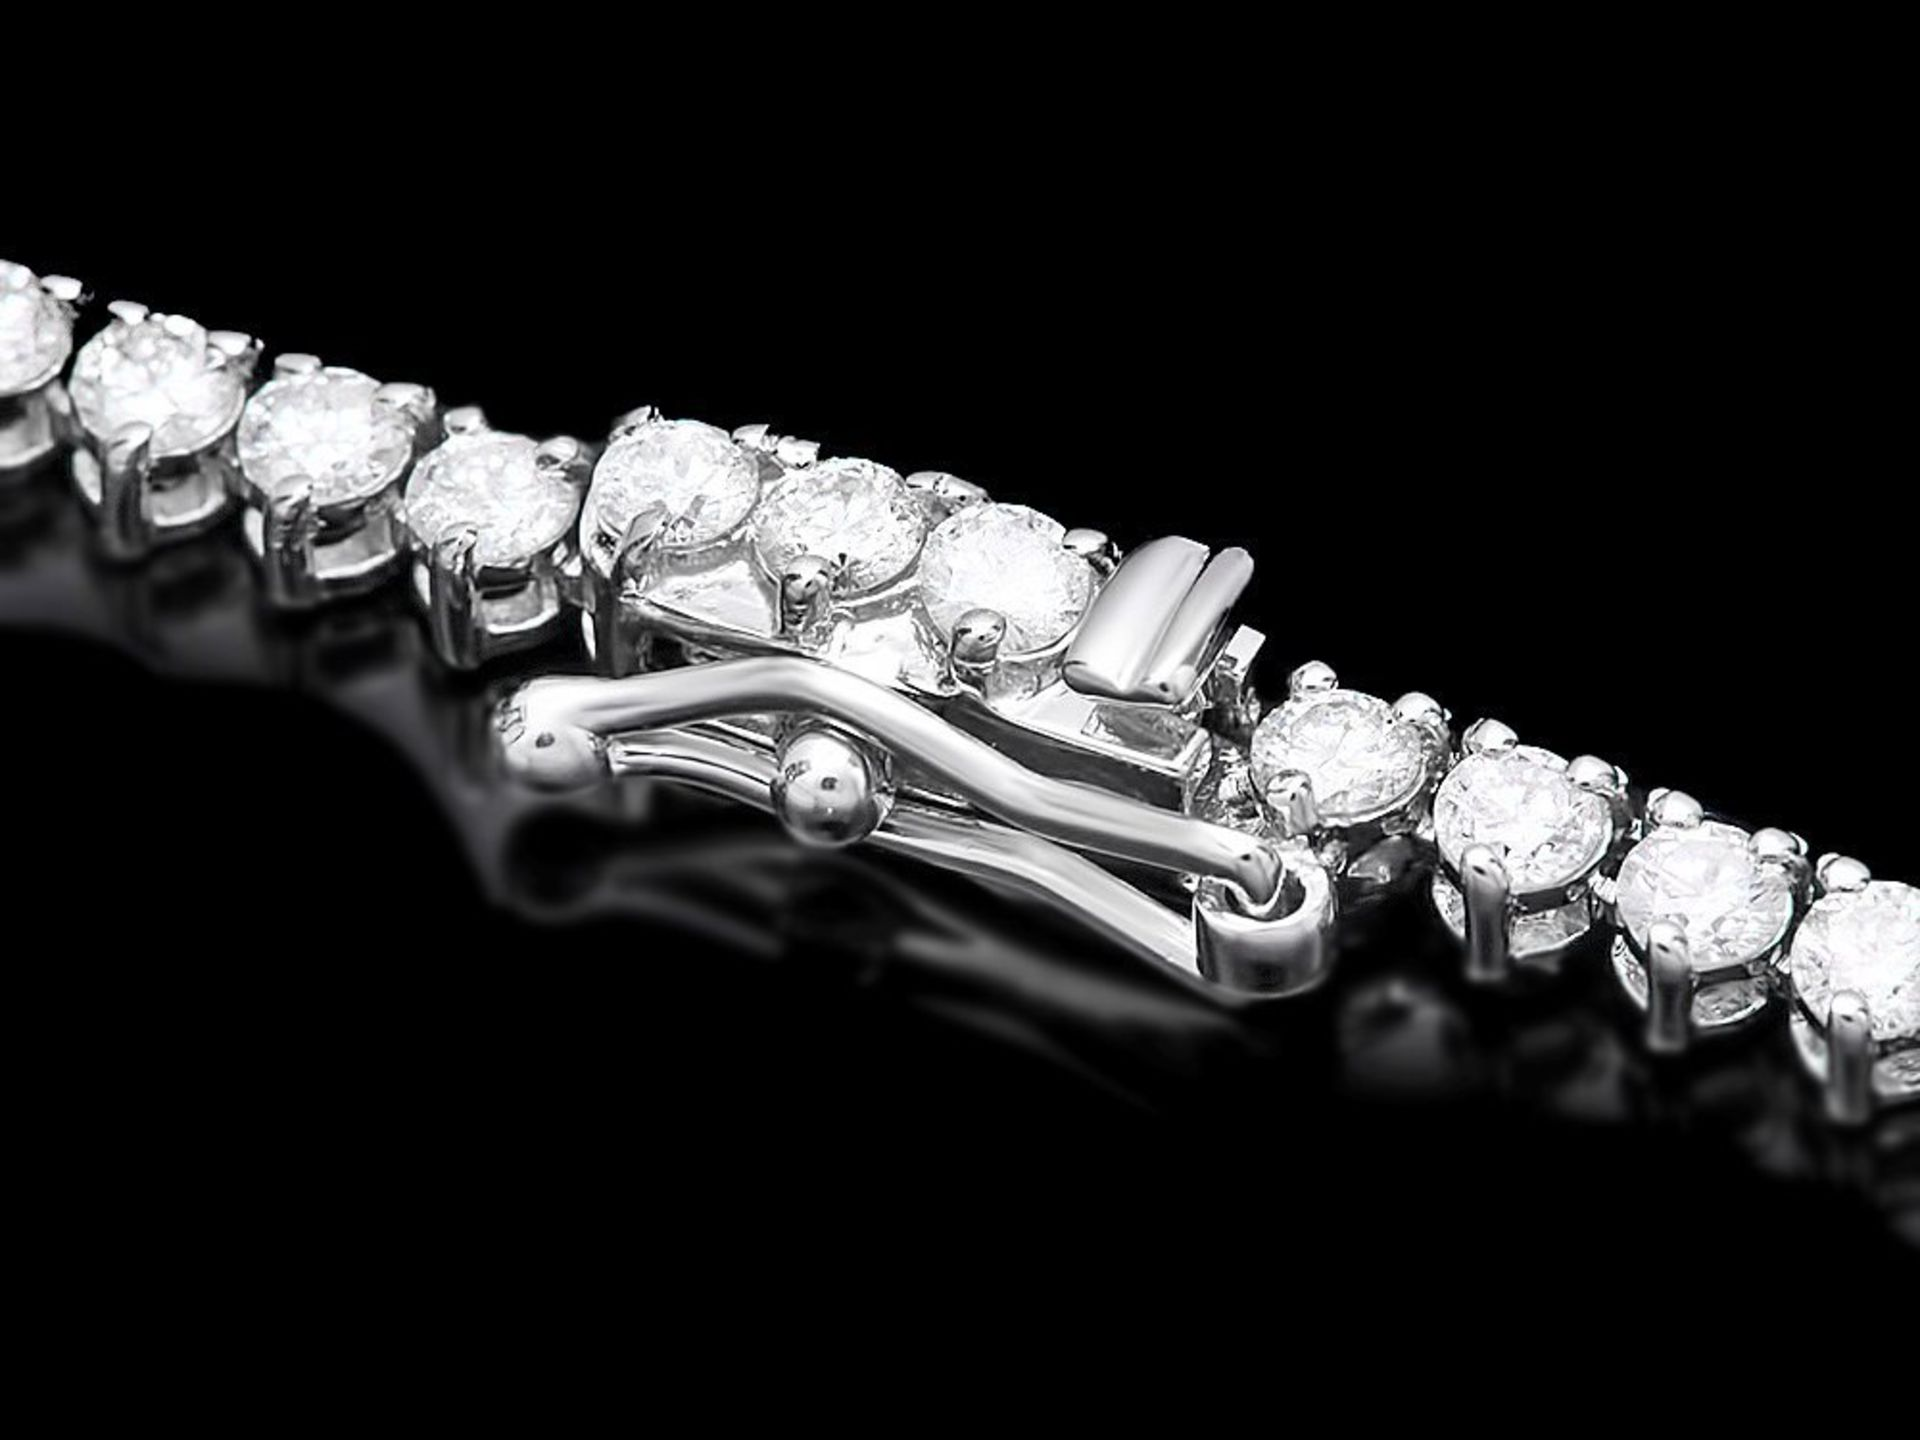 18k White Gold 9.50ct Diamond Necklace - Image 4 of 5